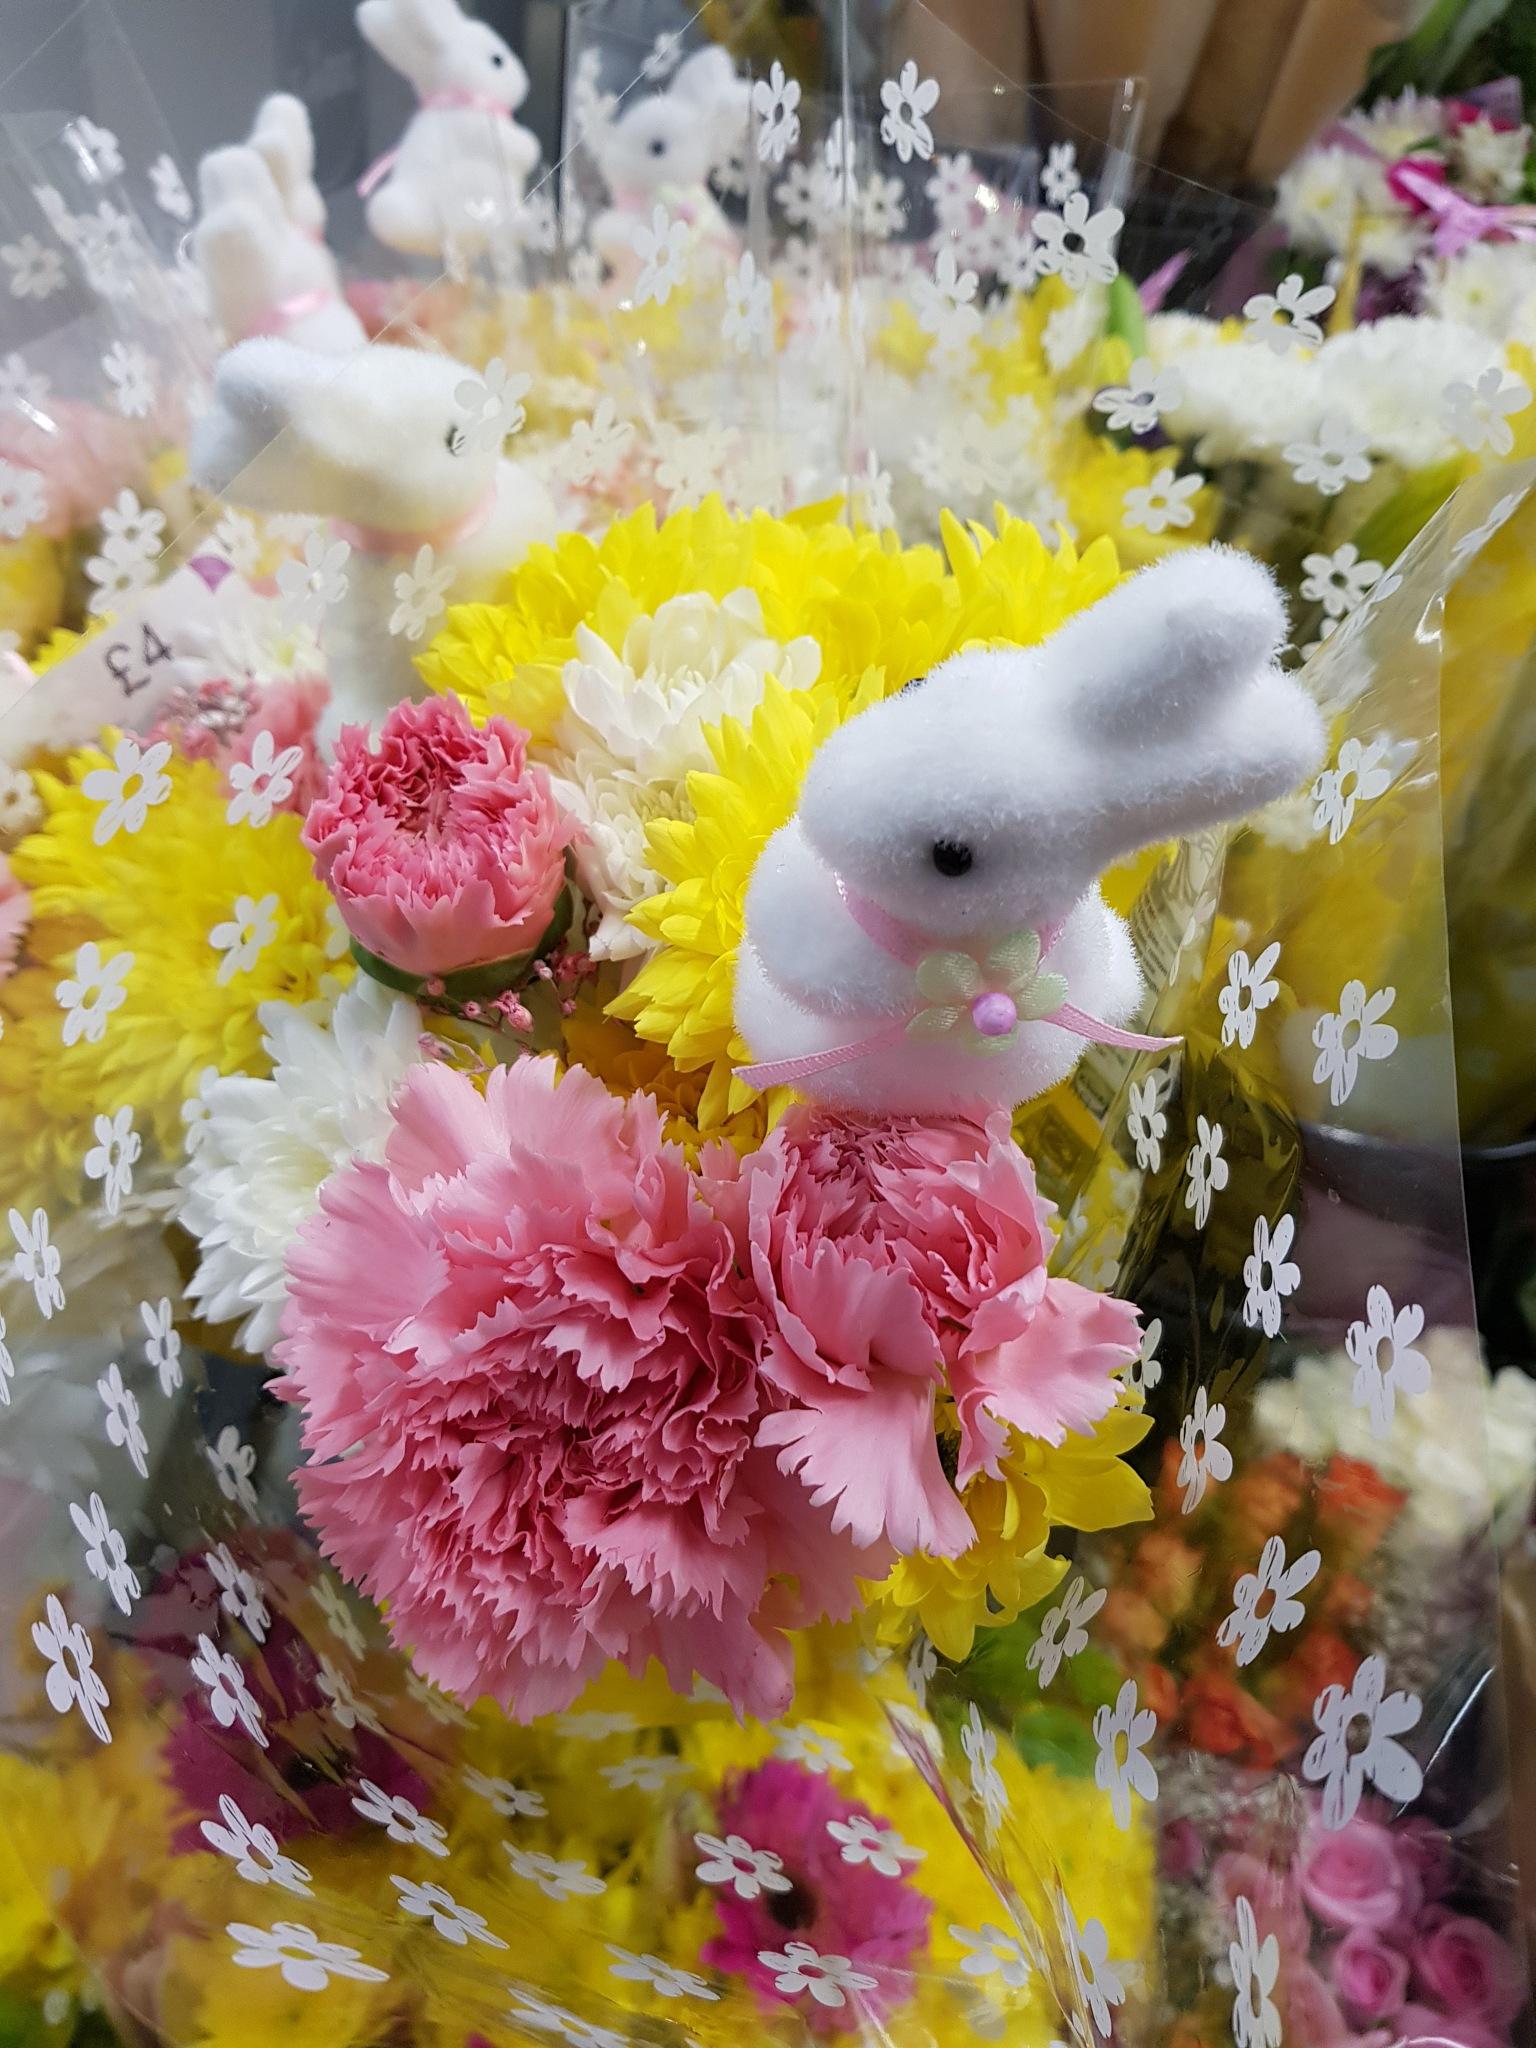 Bunny flower  by Glorwen